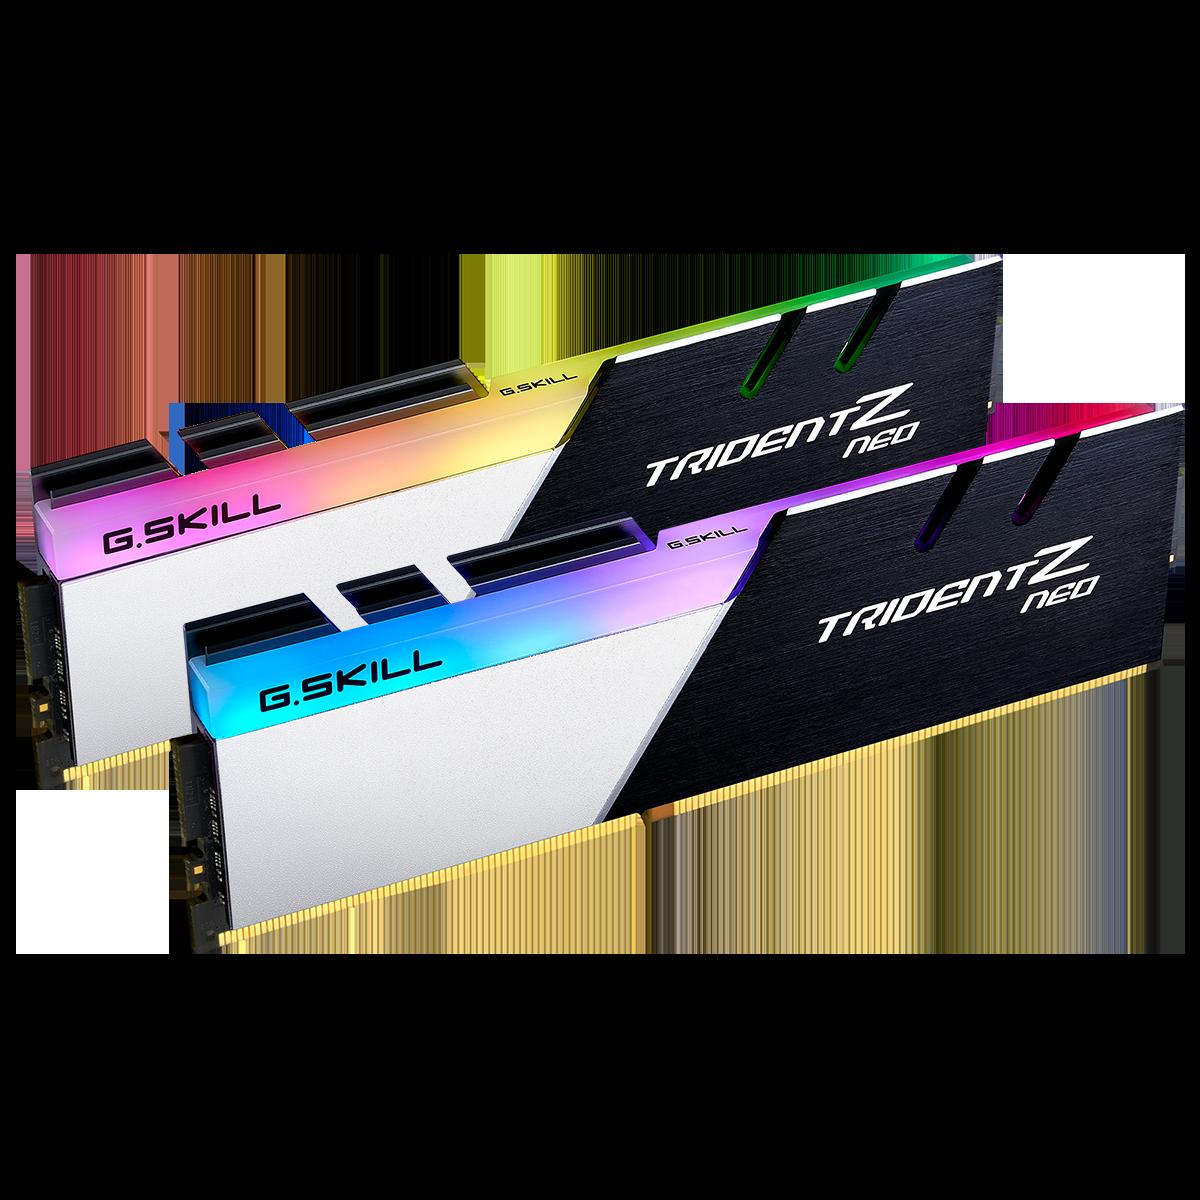 Kit de RAM Trident Z Neo 2 x 16 Go DDR4 3200 MHz G.SkillNoir